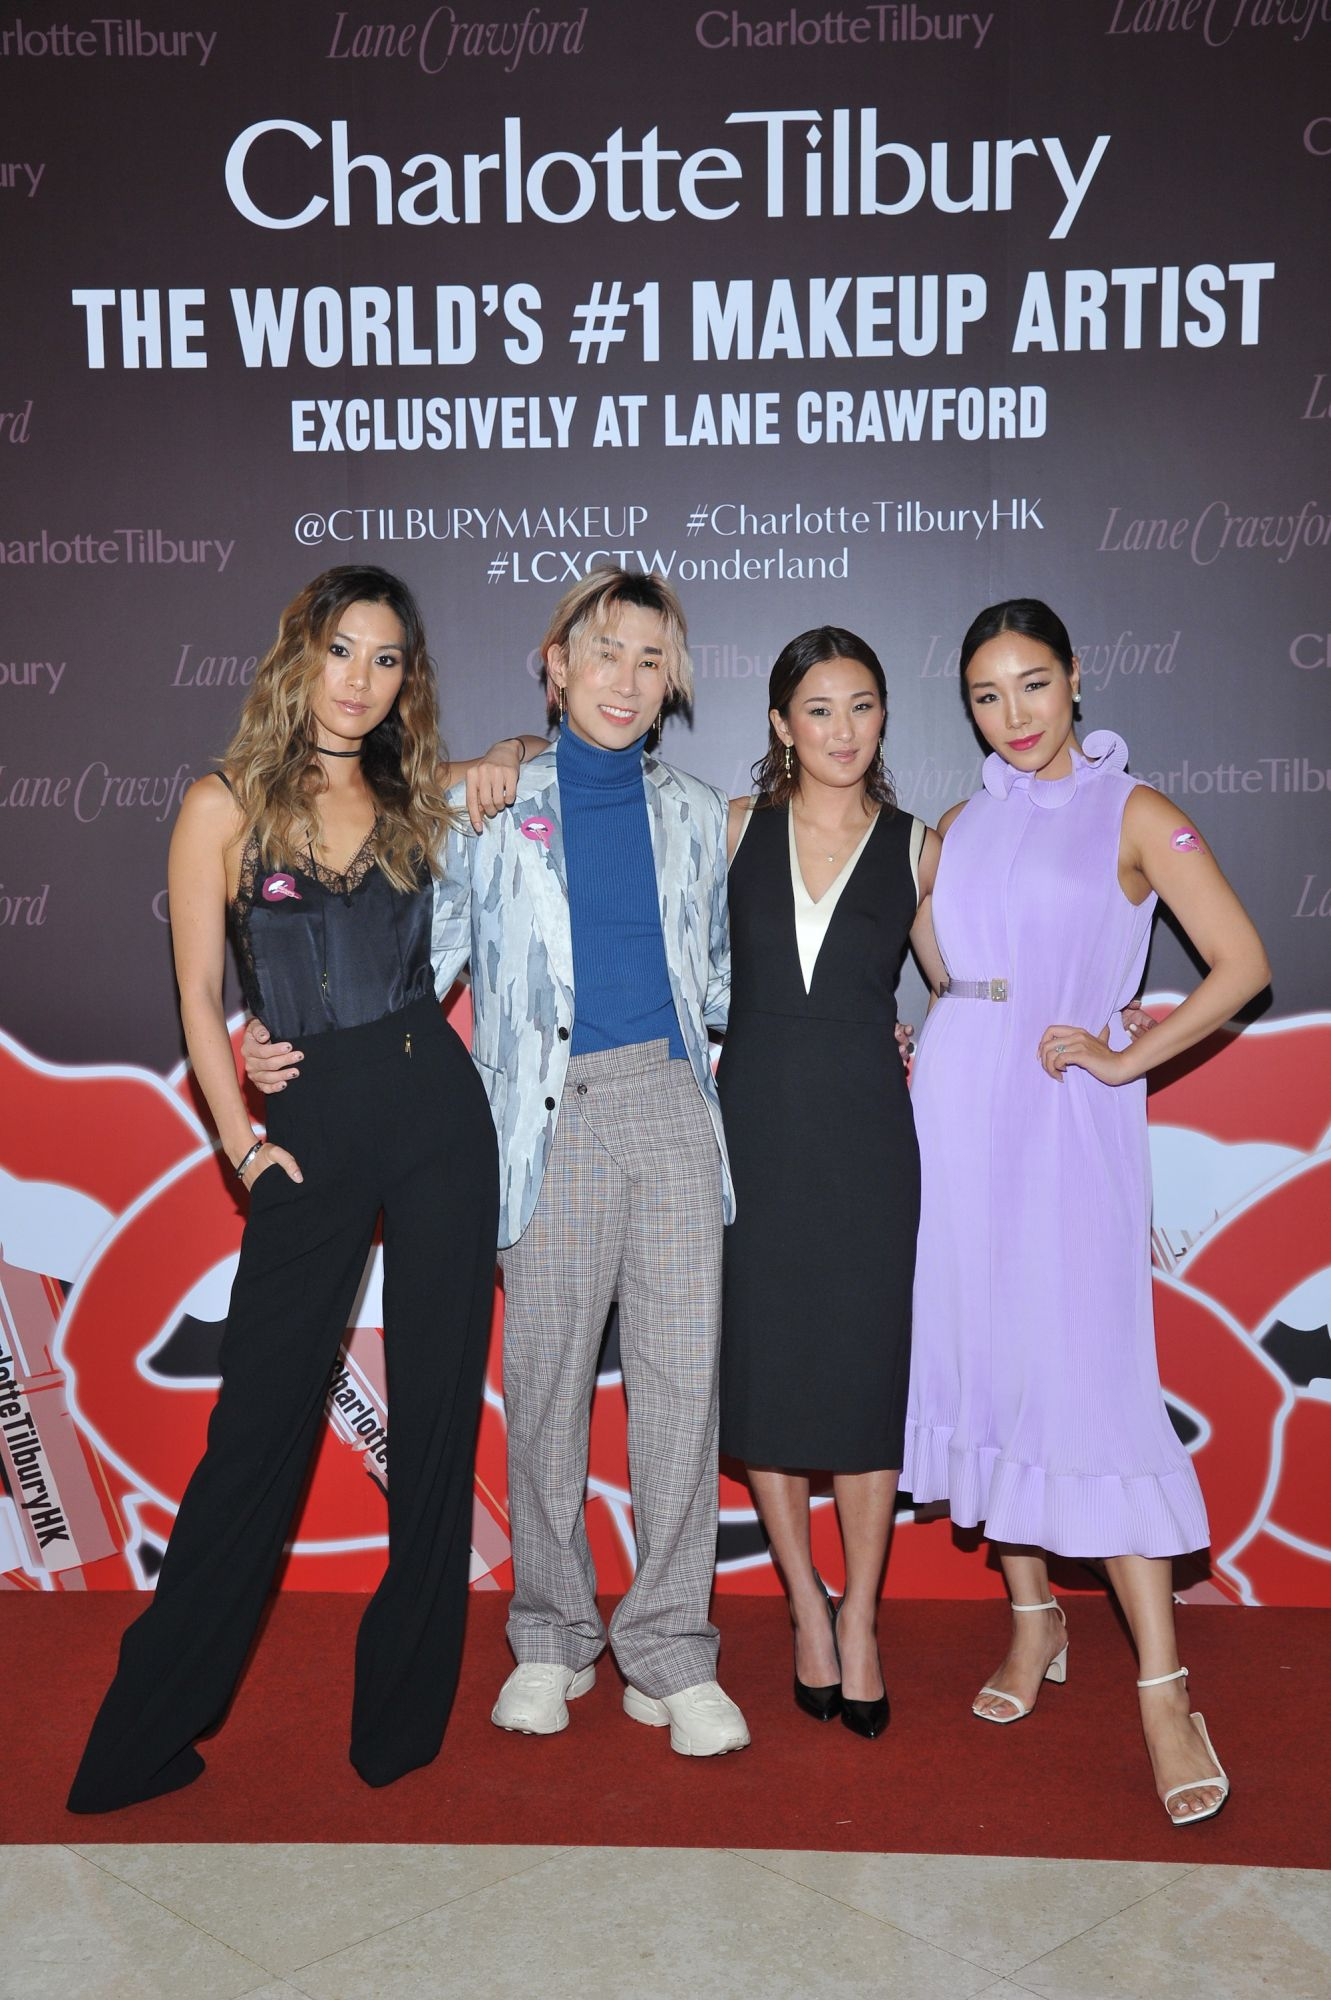 Alison Chan-El Azar, Ma Yao, Antonia Li, Feiping Chang